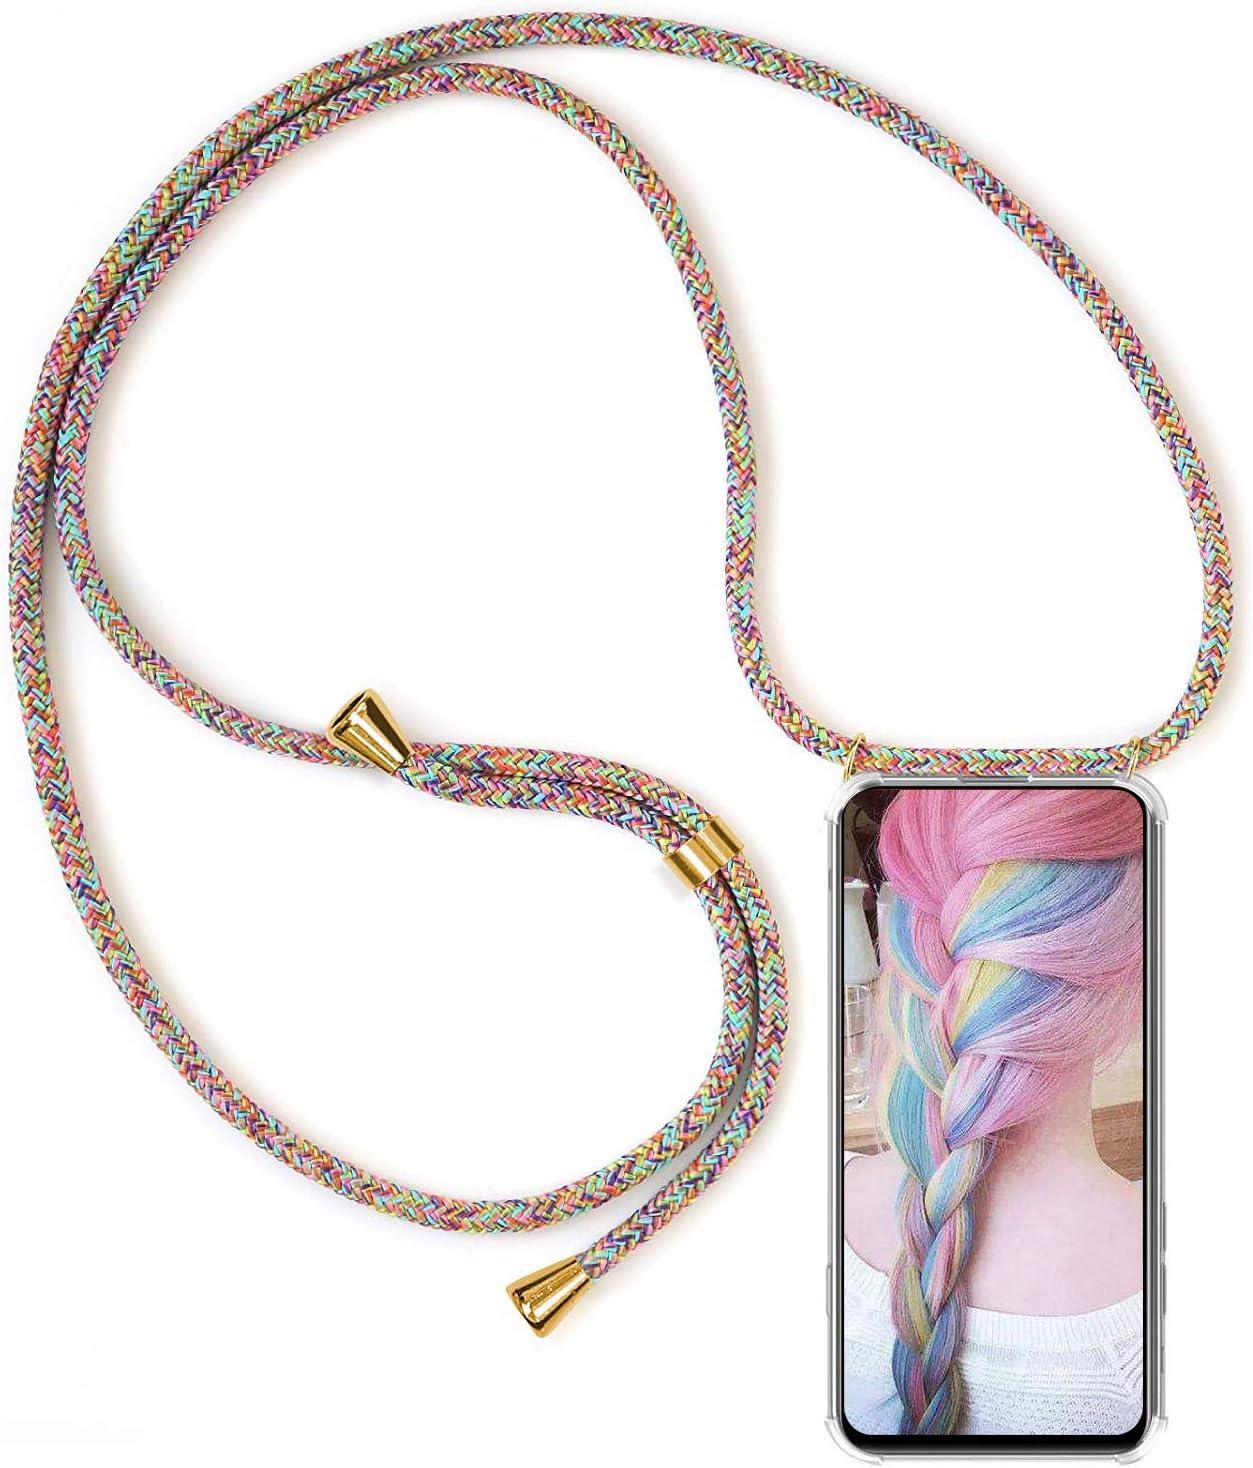 Funda para Cuerda Samsung Galaxy Note 10 Plus Carcasa Transparente de Correa Colgante Collar Ultrafino Ultraligero Moda Practico Silicona TPU Gel Case Anti-Choque Anti-rasgu/ños Albaricoque Azul